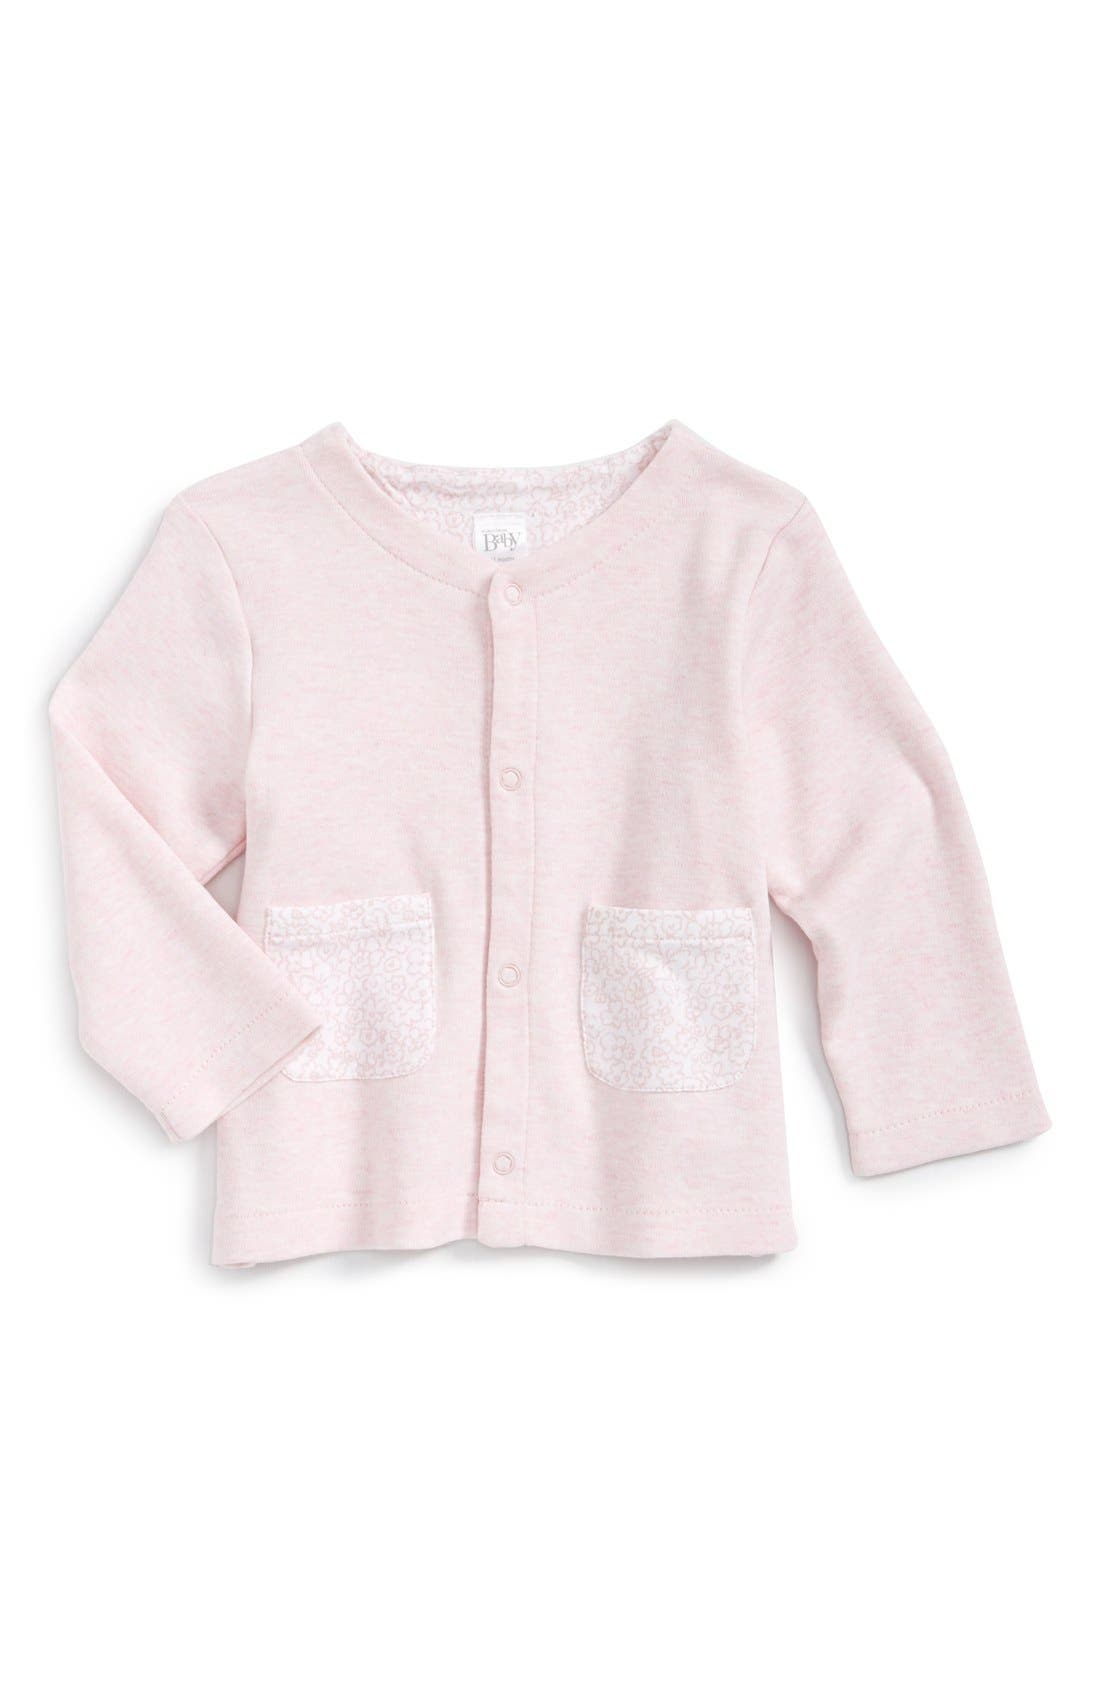 Nordstrom Baby Contrast Pocket Cotton Cardigan (Baby Girls)